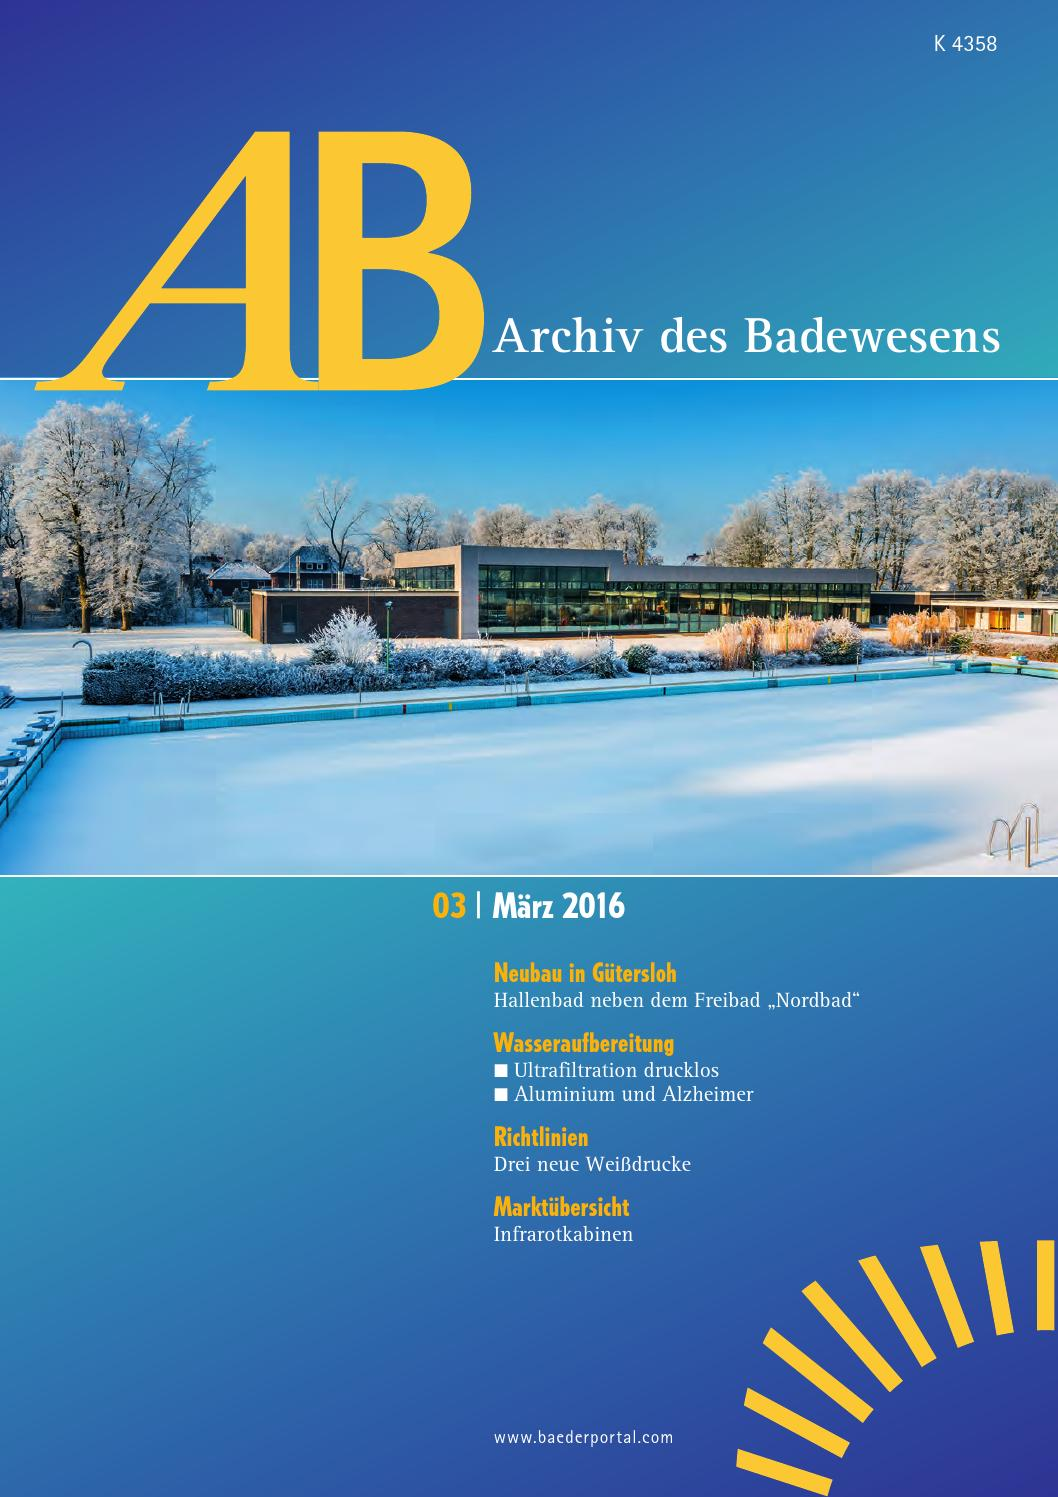 2016 03 00 by Baederportal - issuu